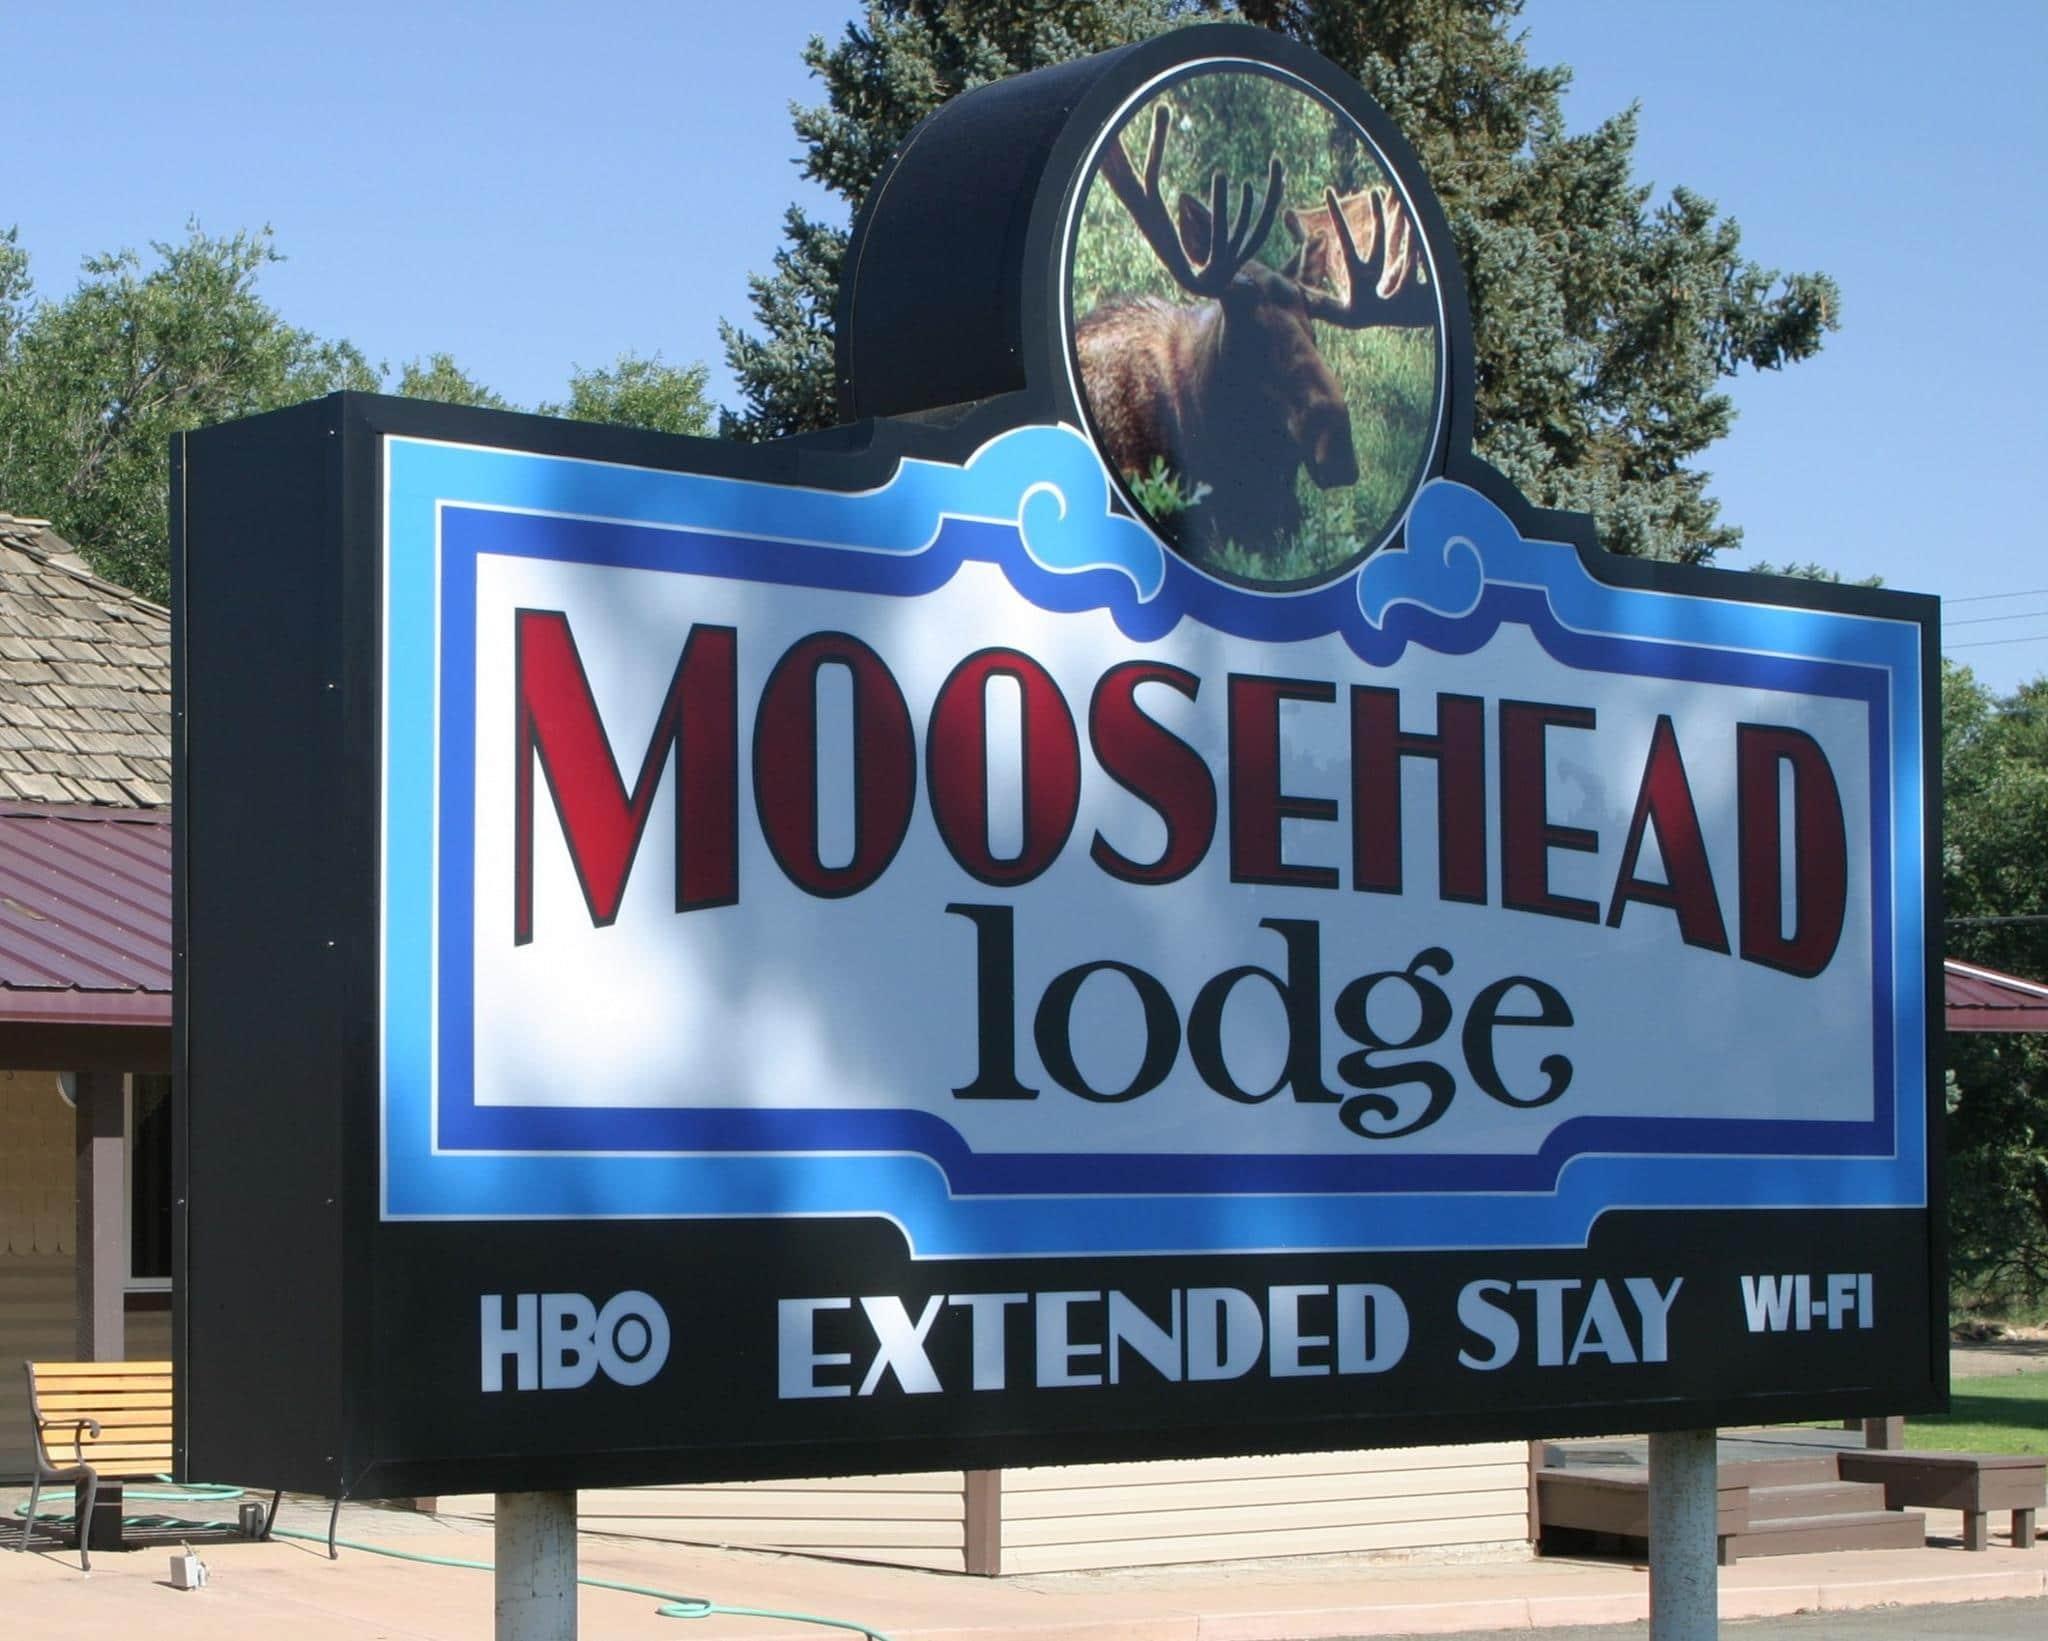 image of moosehead lodge